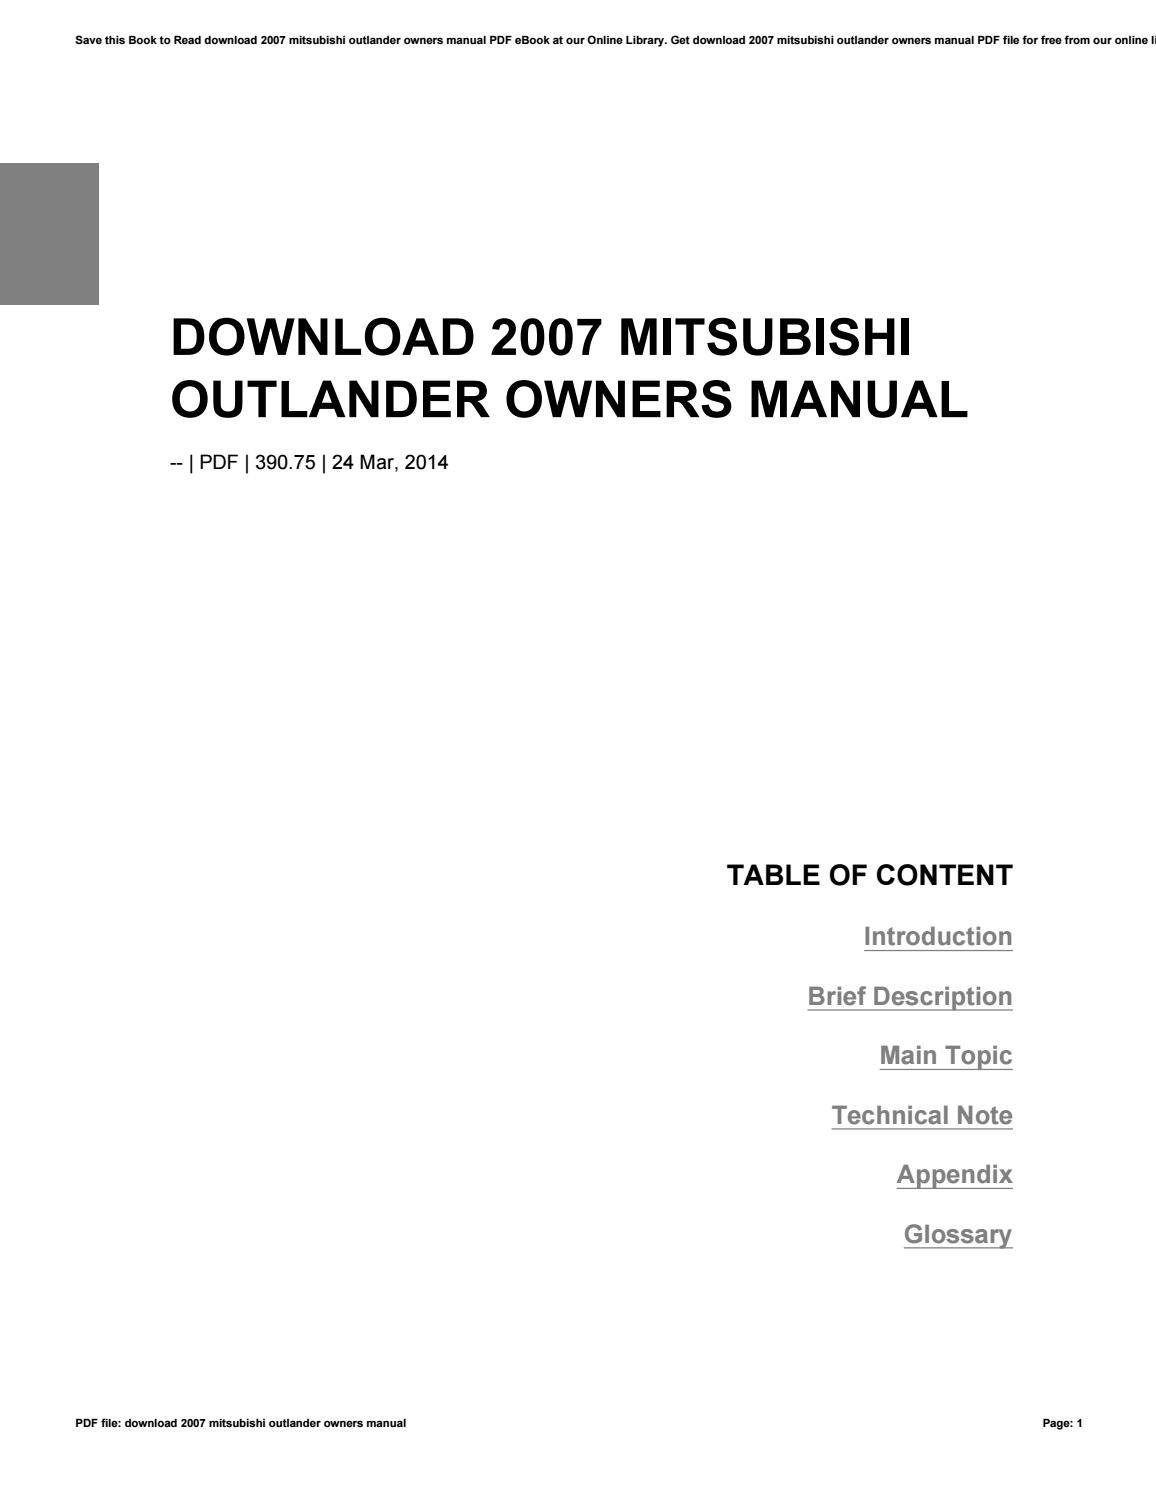 Owner & Operator Manuals MITSUBISHI OUTLANDER 2014 OWNERS MANUAL ...